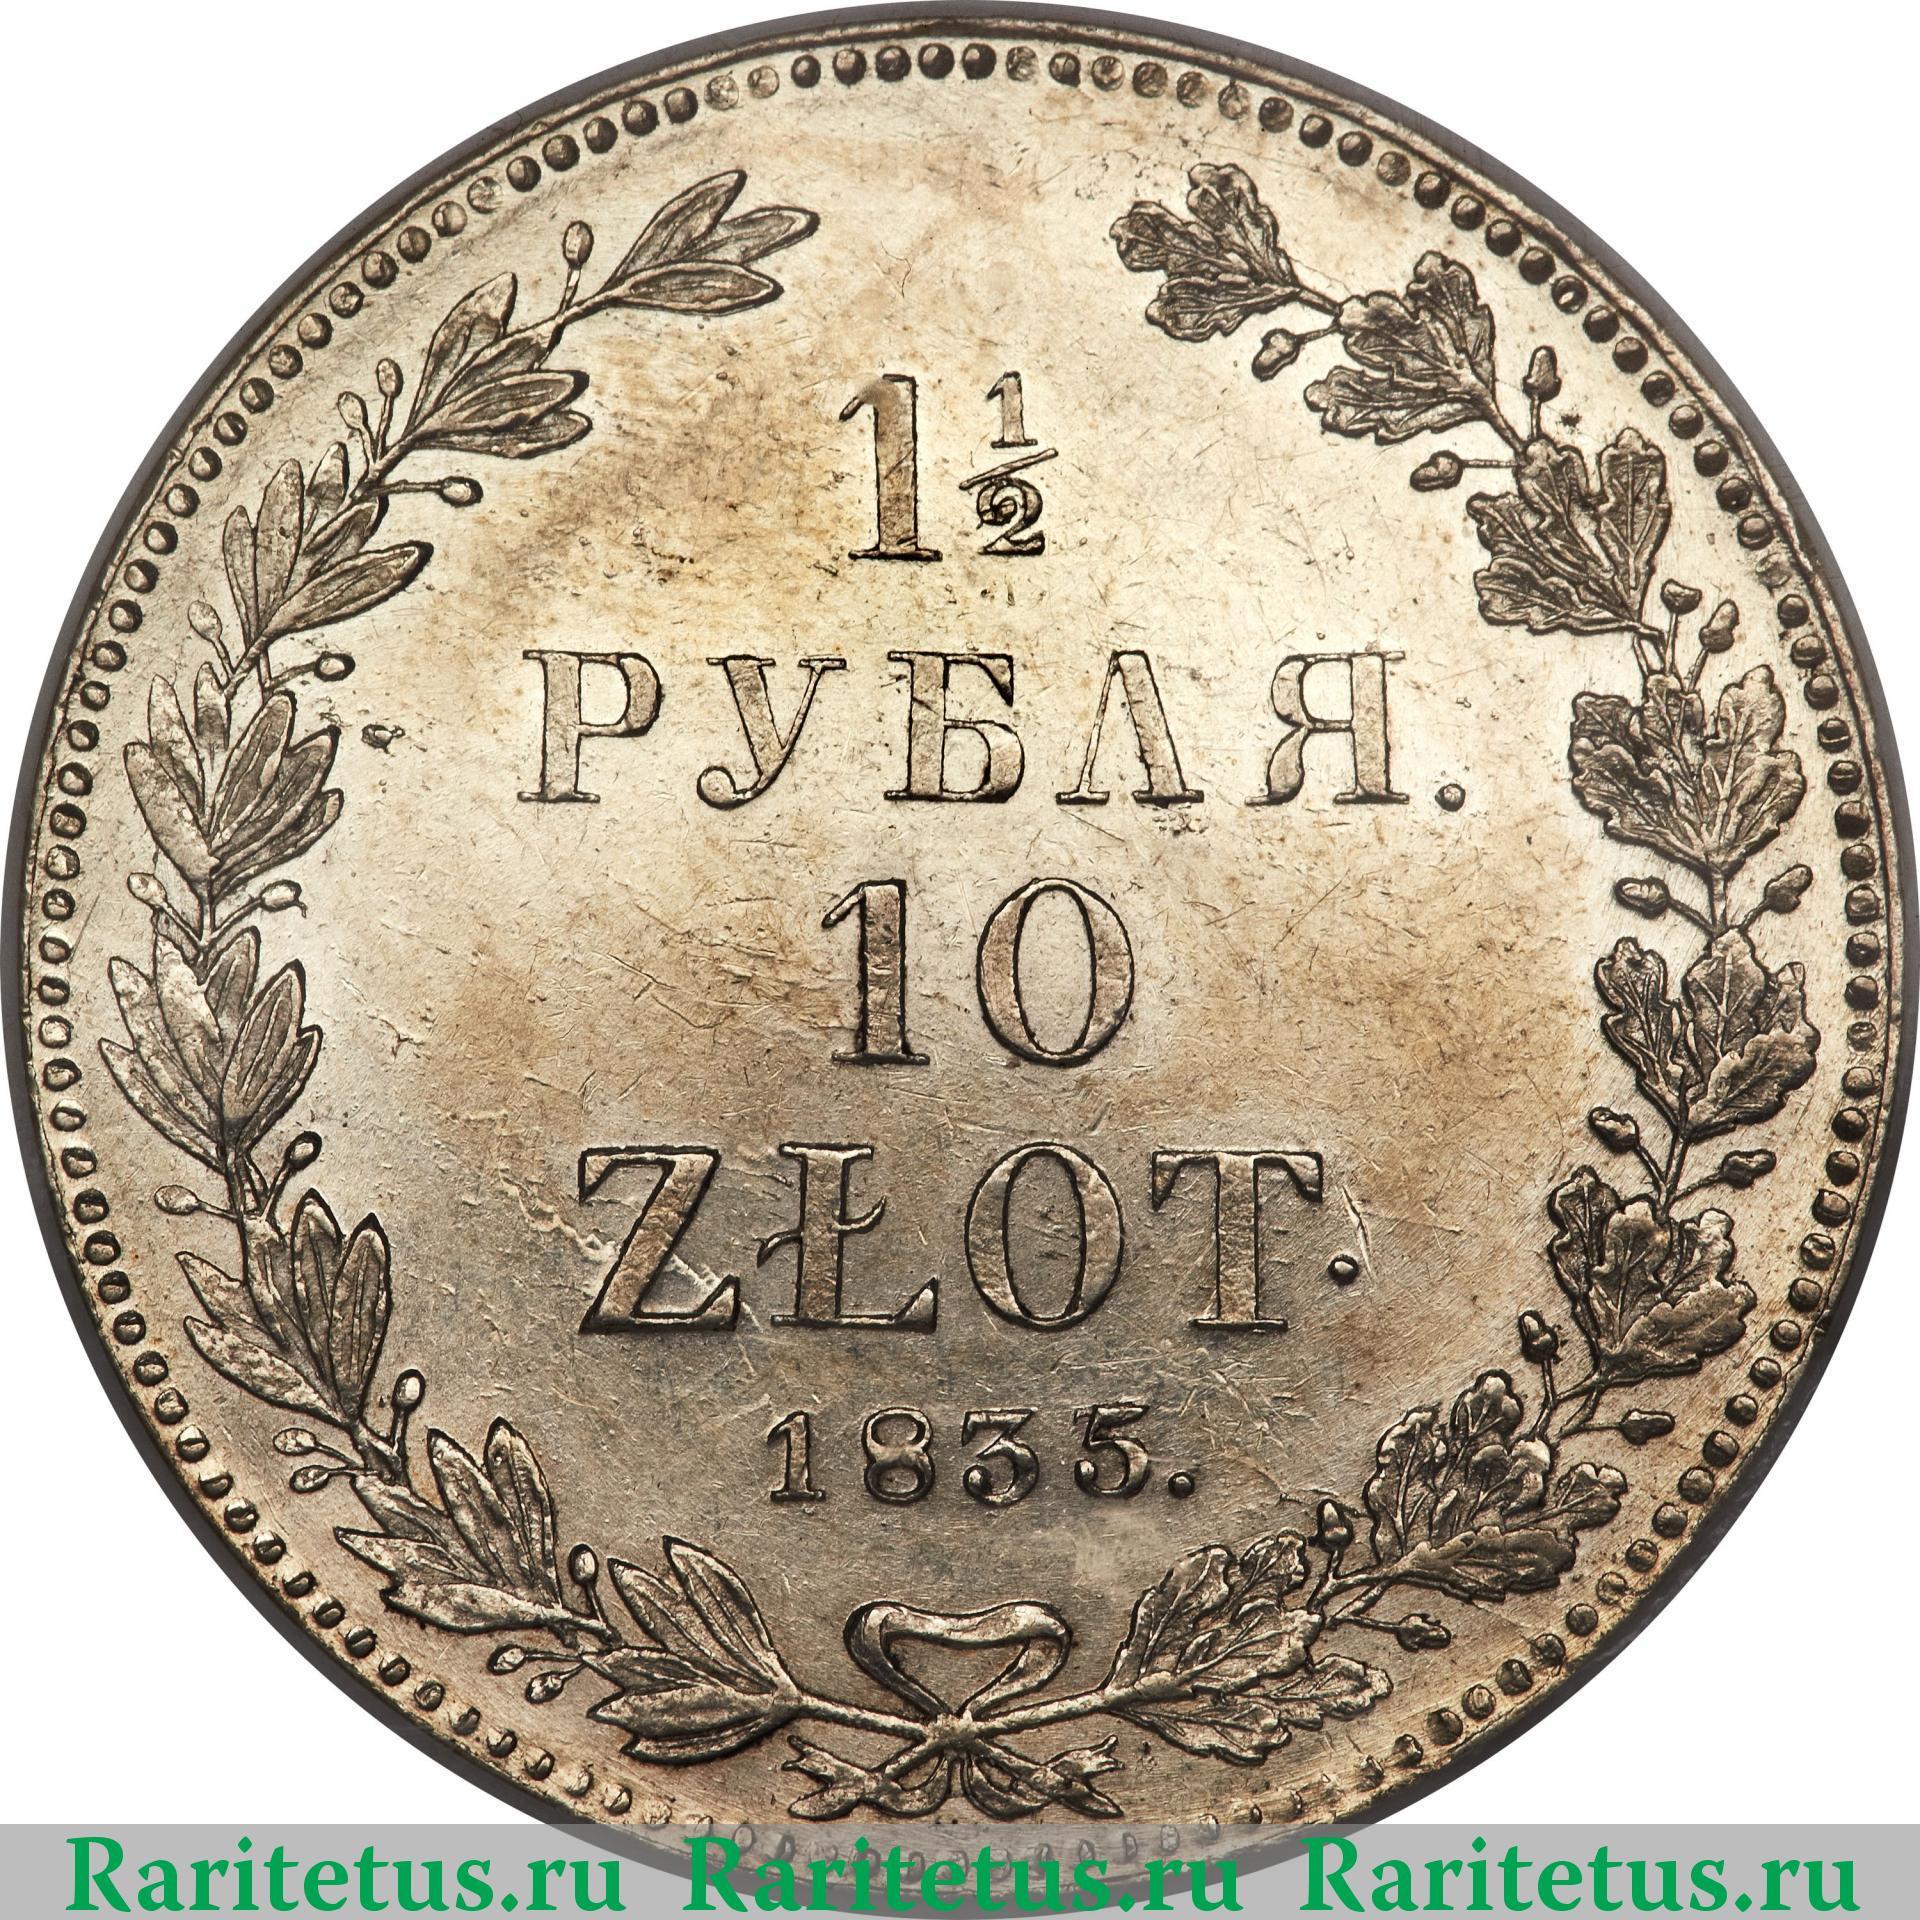 Монета 1835 купить манок на гуся ред бон